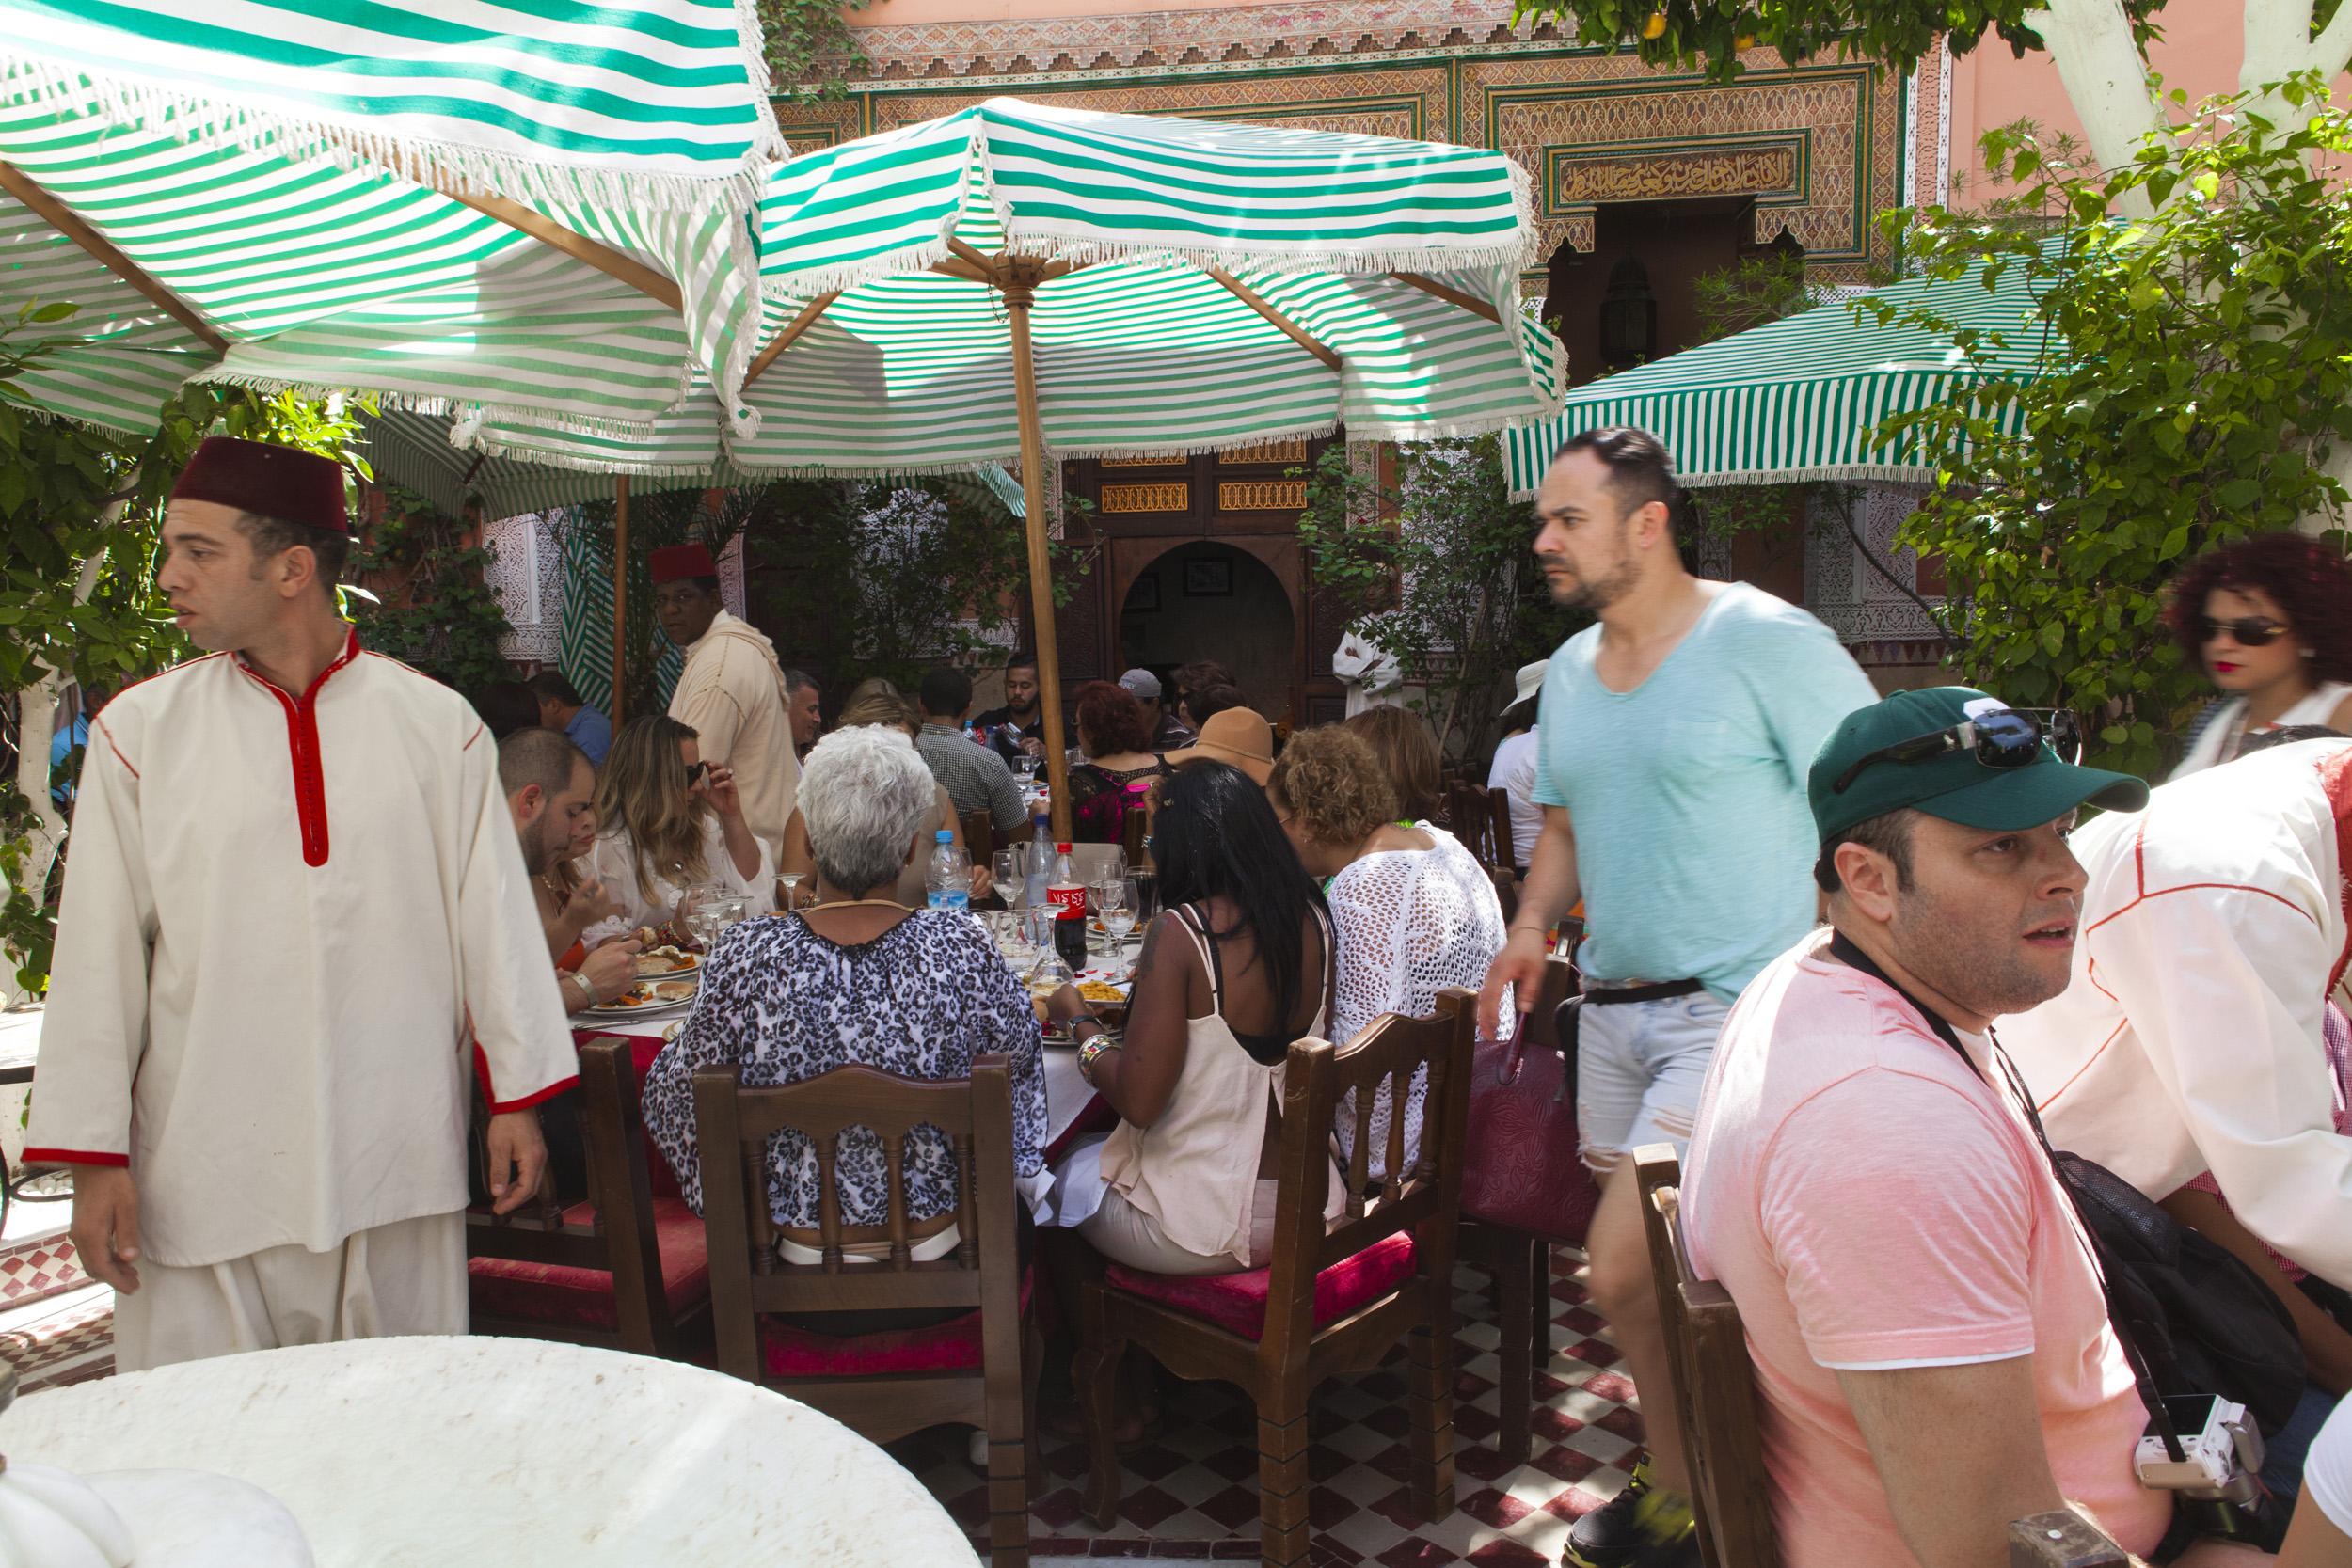 marrakech_2_convencion_anual_salerm_cosmetics_proline_04